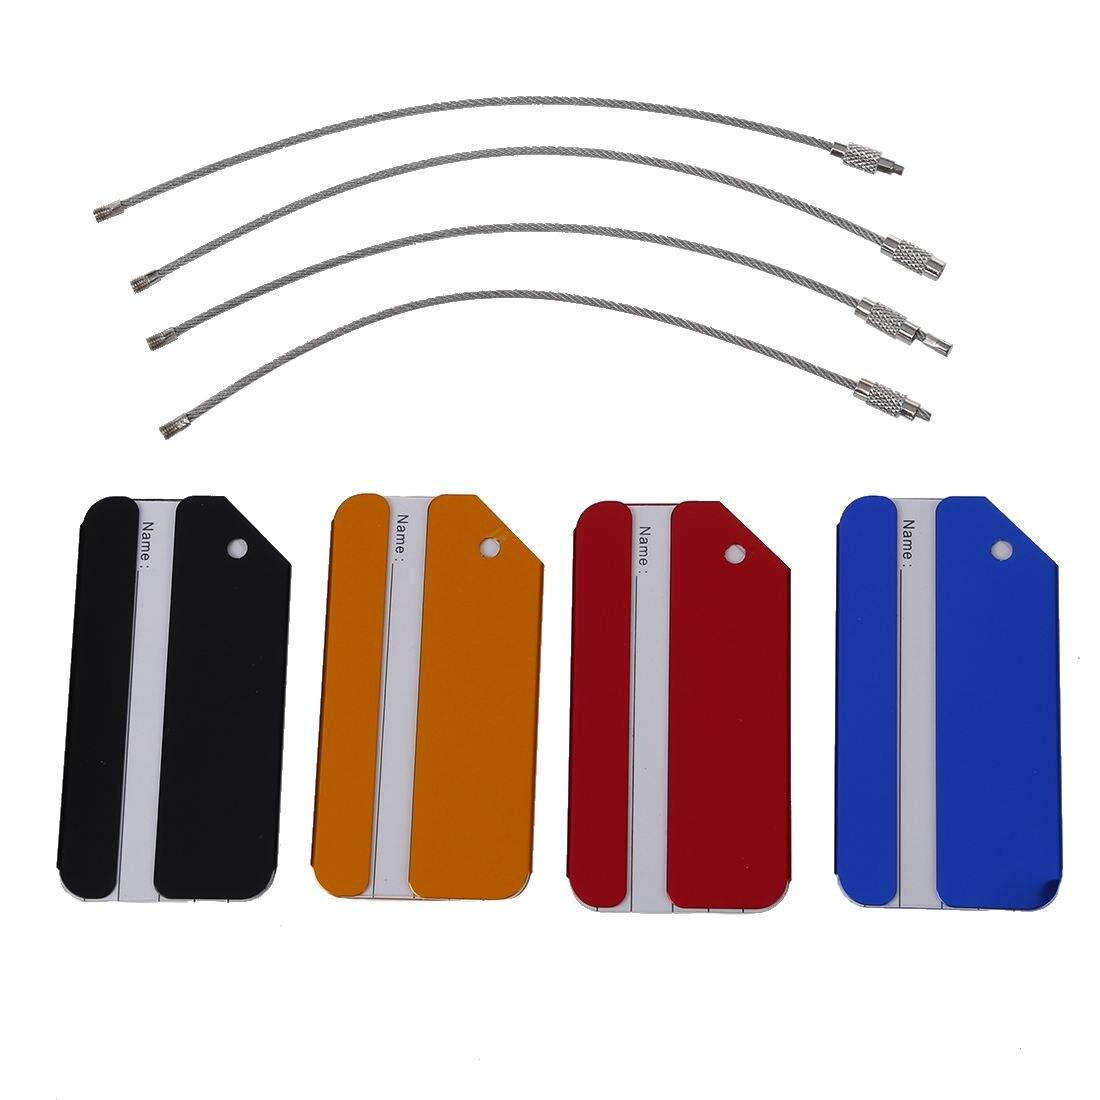 TFTP 4pcs Aluminium Metal Travel Luggage Baggage Suitcase Address Tags Label Holder